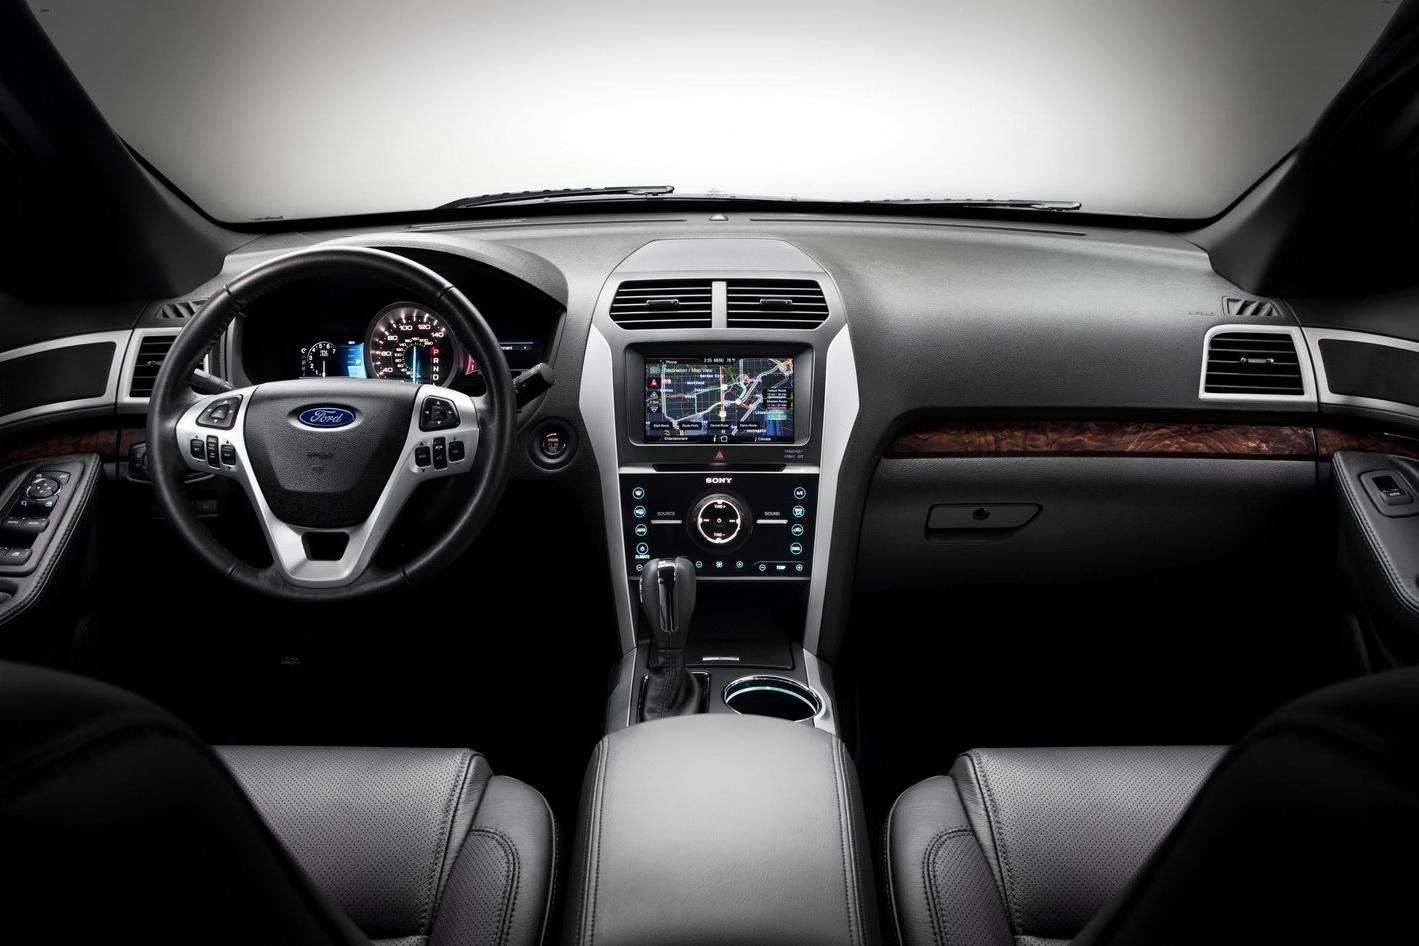 http://2.bp.blogspot.com/-P-mYIlibzHA/TVNZ64Z0_mI/AAAAAAAAA5M/Mf5dR6hgMT8/s1600/2011-Ford-Explorer-4.jpg